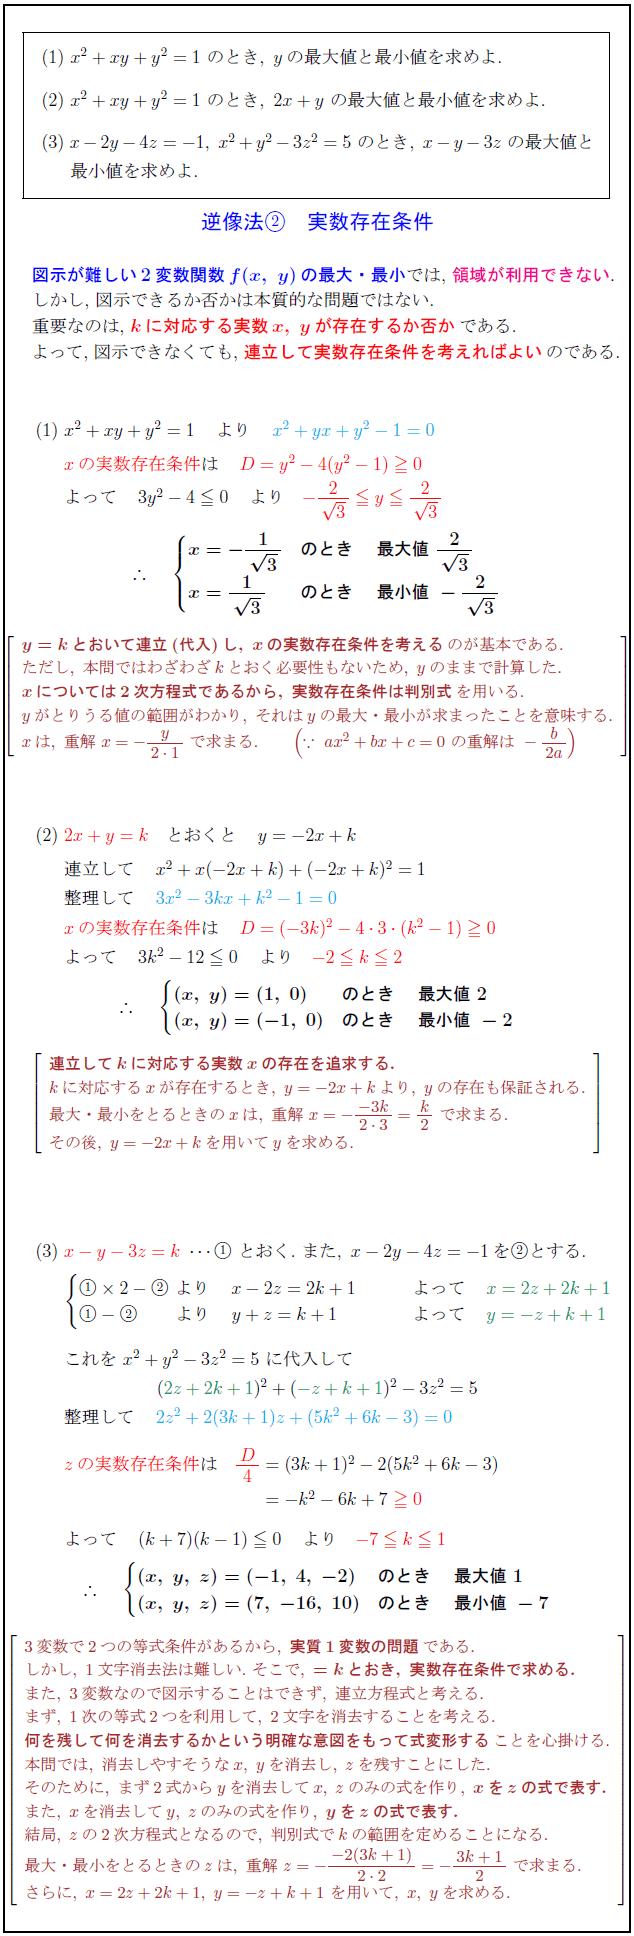 inverse-image2